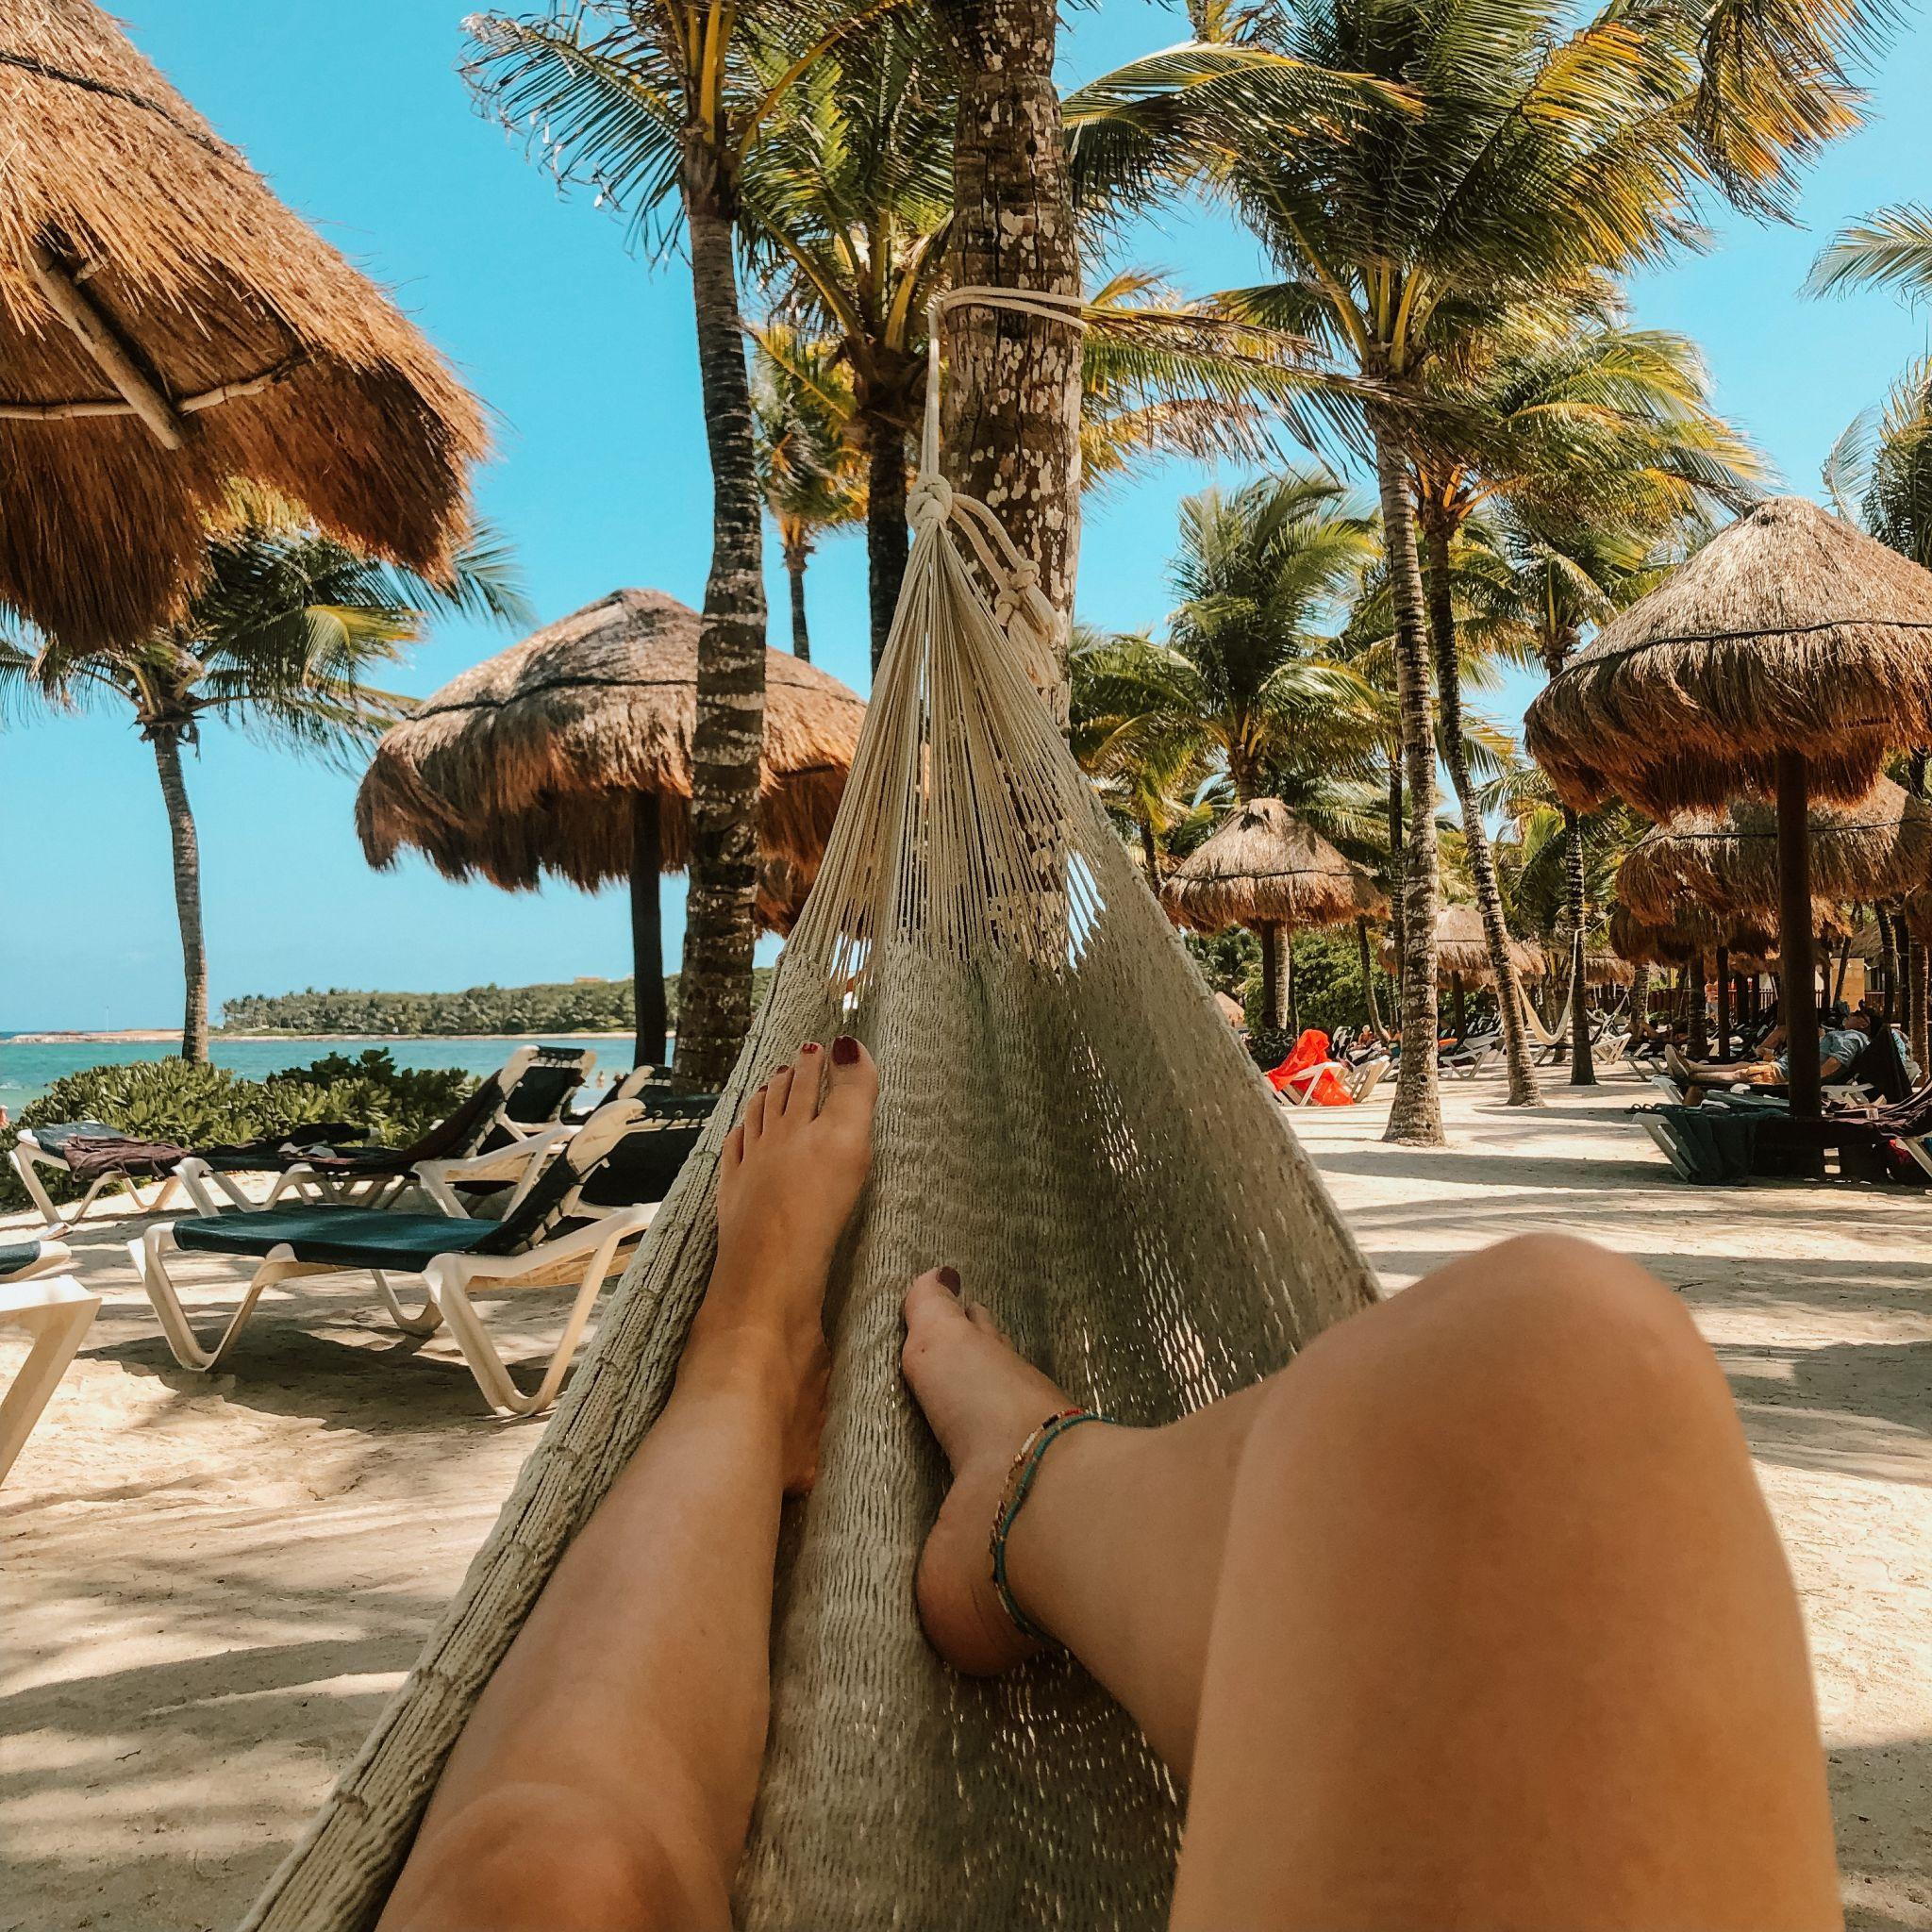 Honeymoon in Mexico at TRS Yucatan Beach